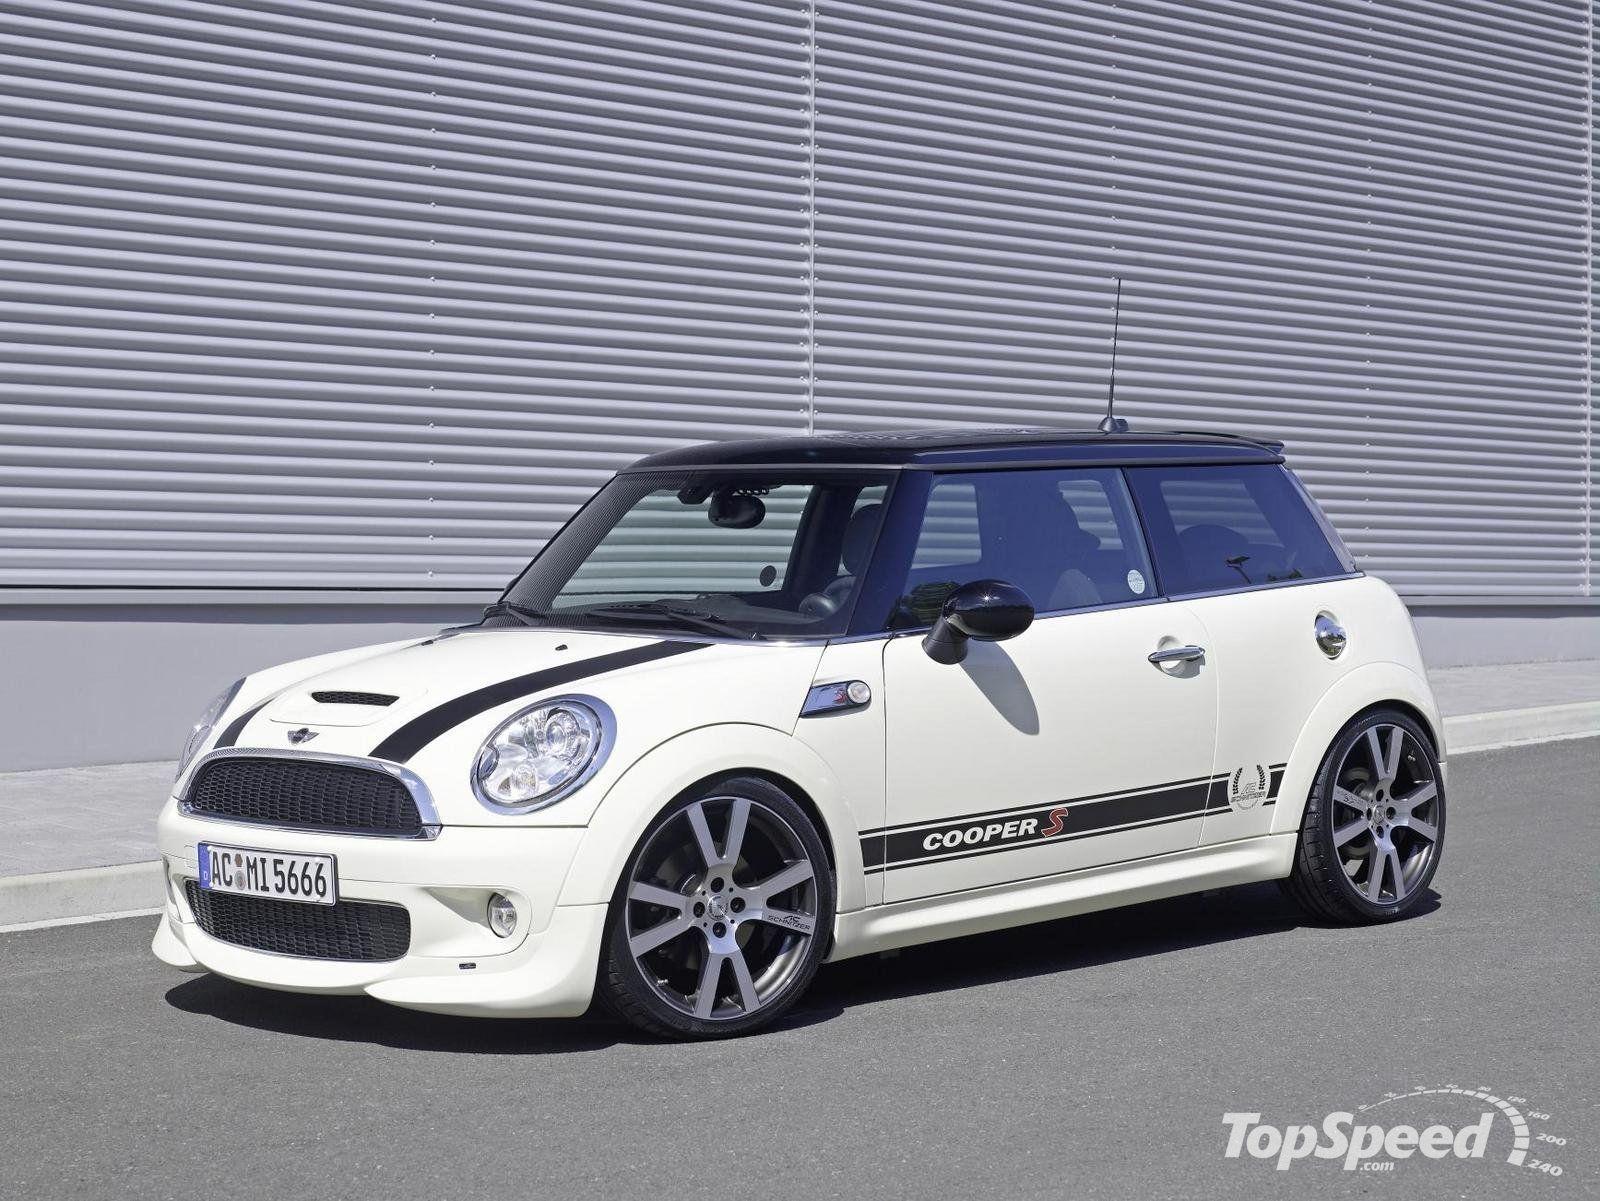 Mini cooper s my next car for sure